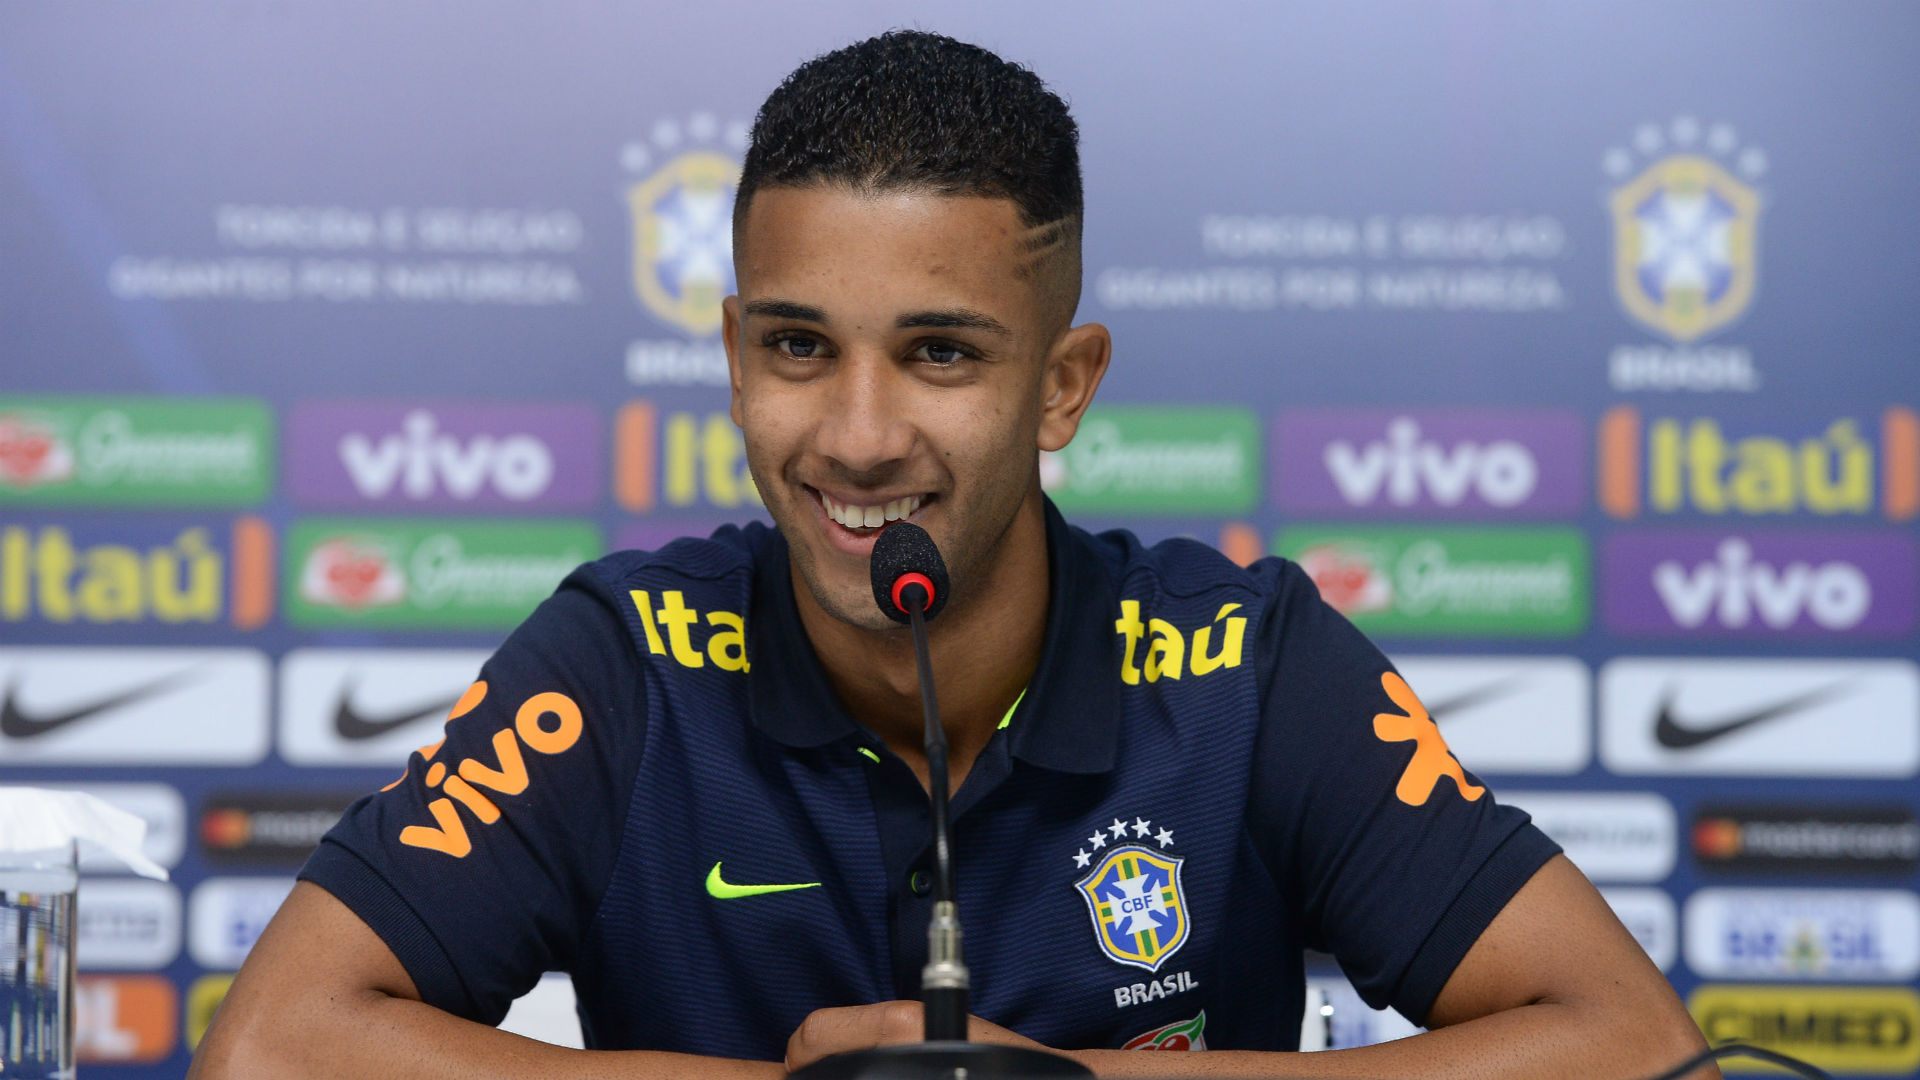 Jorge Seleção Brasil 02 10 2017